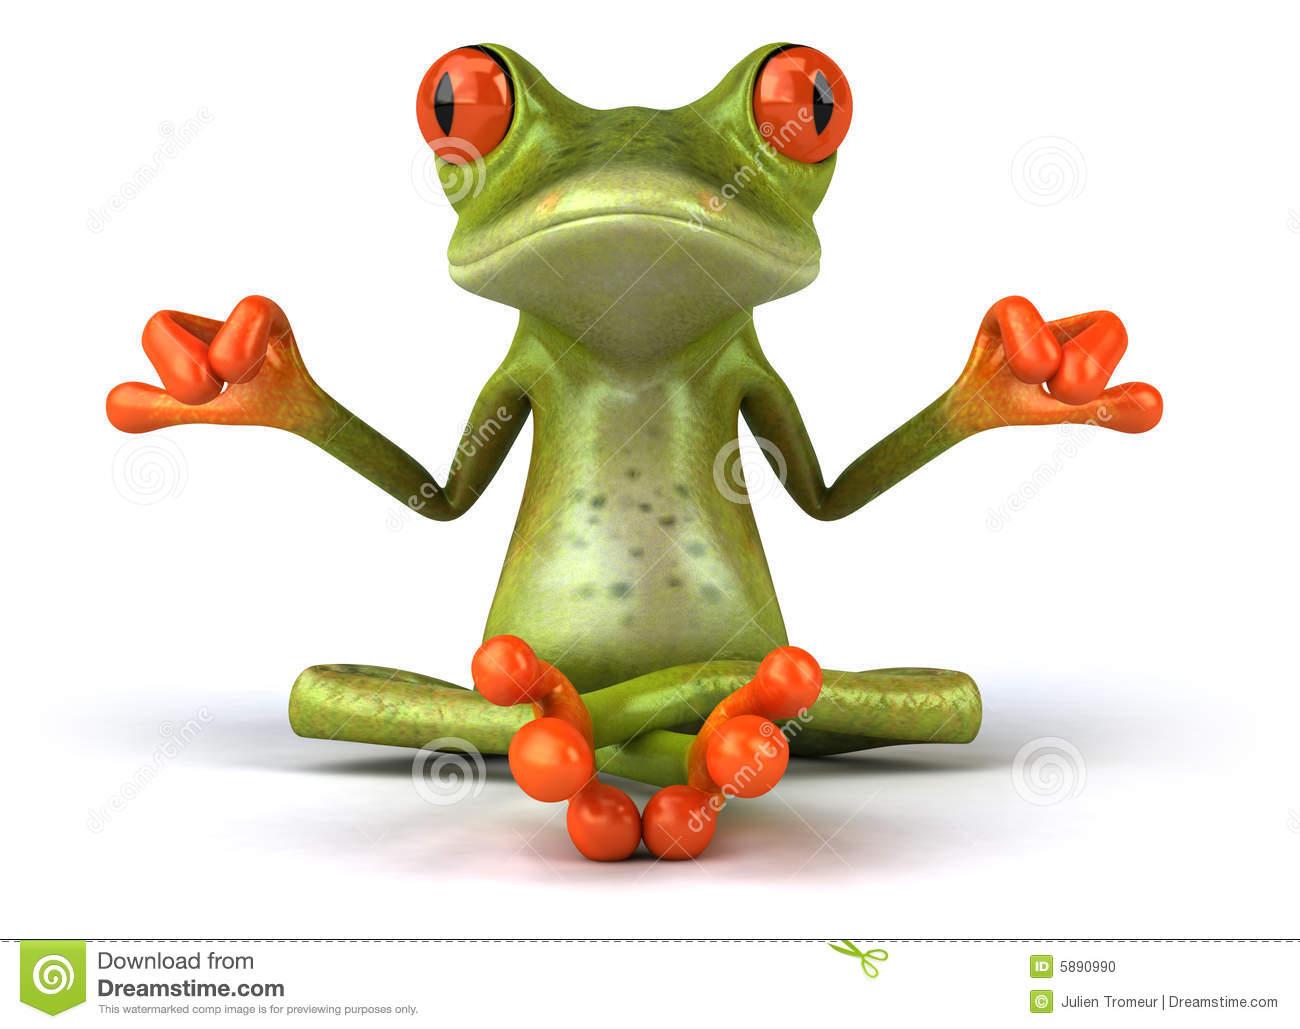 http://www.dreamstime.com/stock-photo-zen-frog-image5890990